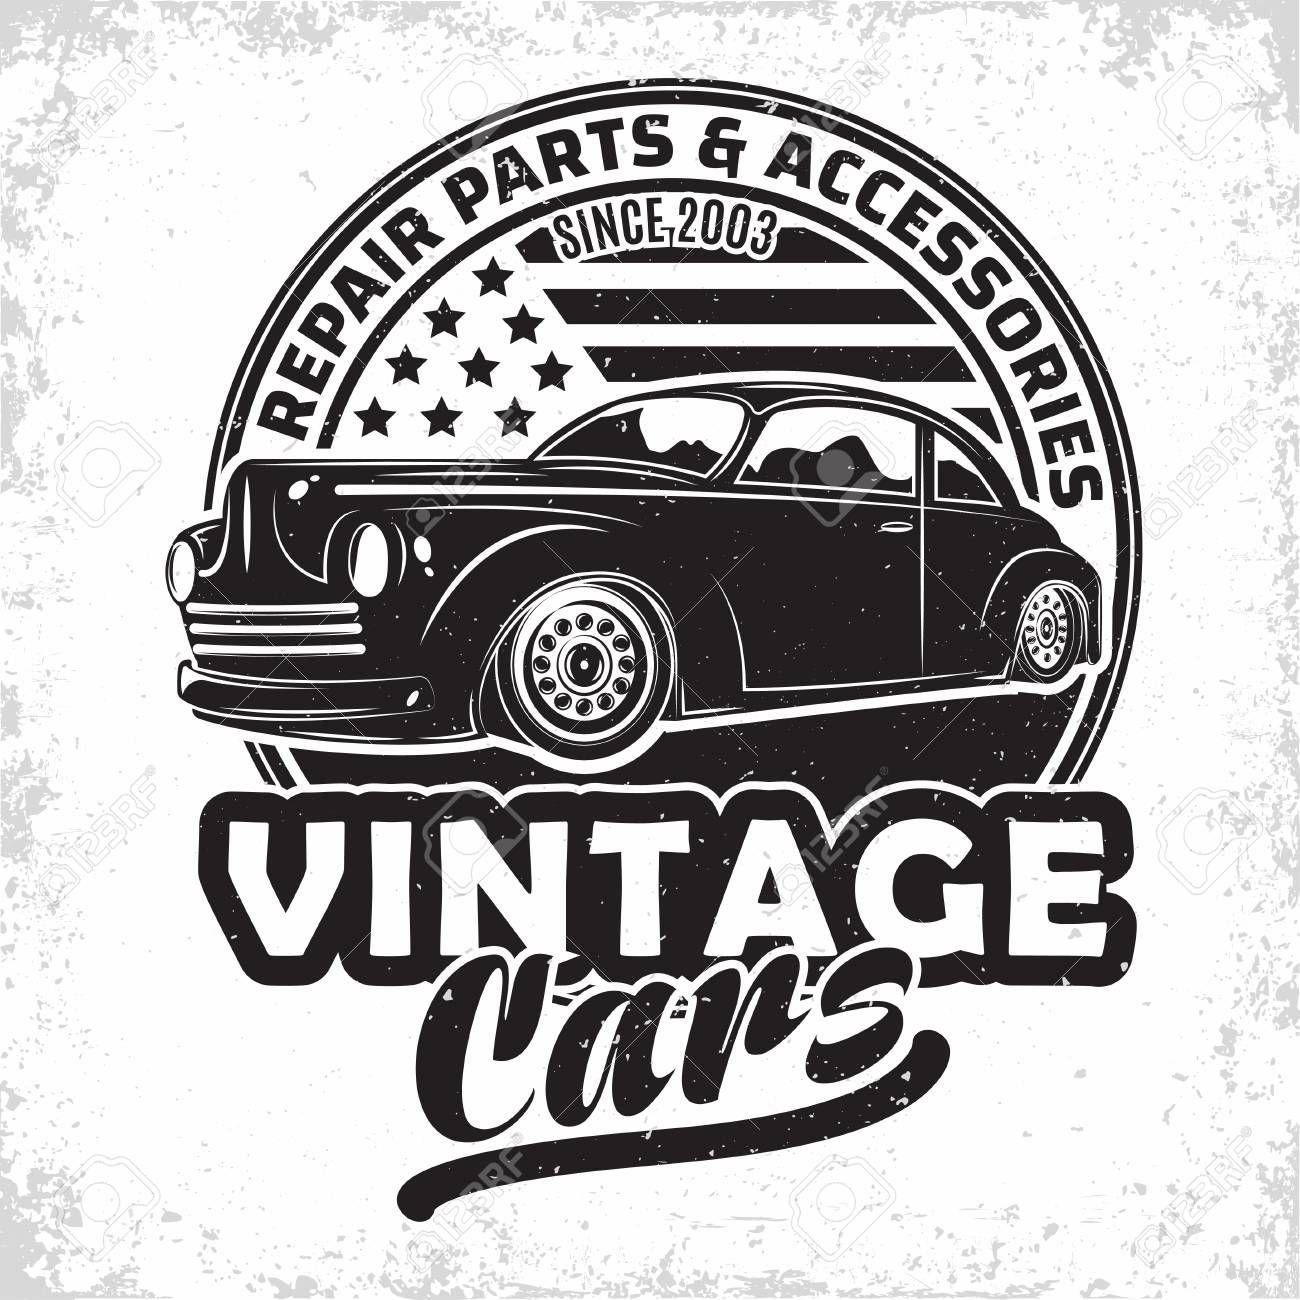 Hot Rod Garage Logo Design Emblem Of Muscle Car Repair And Service Organisation Retro Car Garage Print Stamps Hot Rod Typography Emblem Vector Illust Plotten